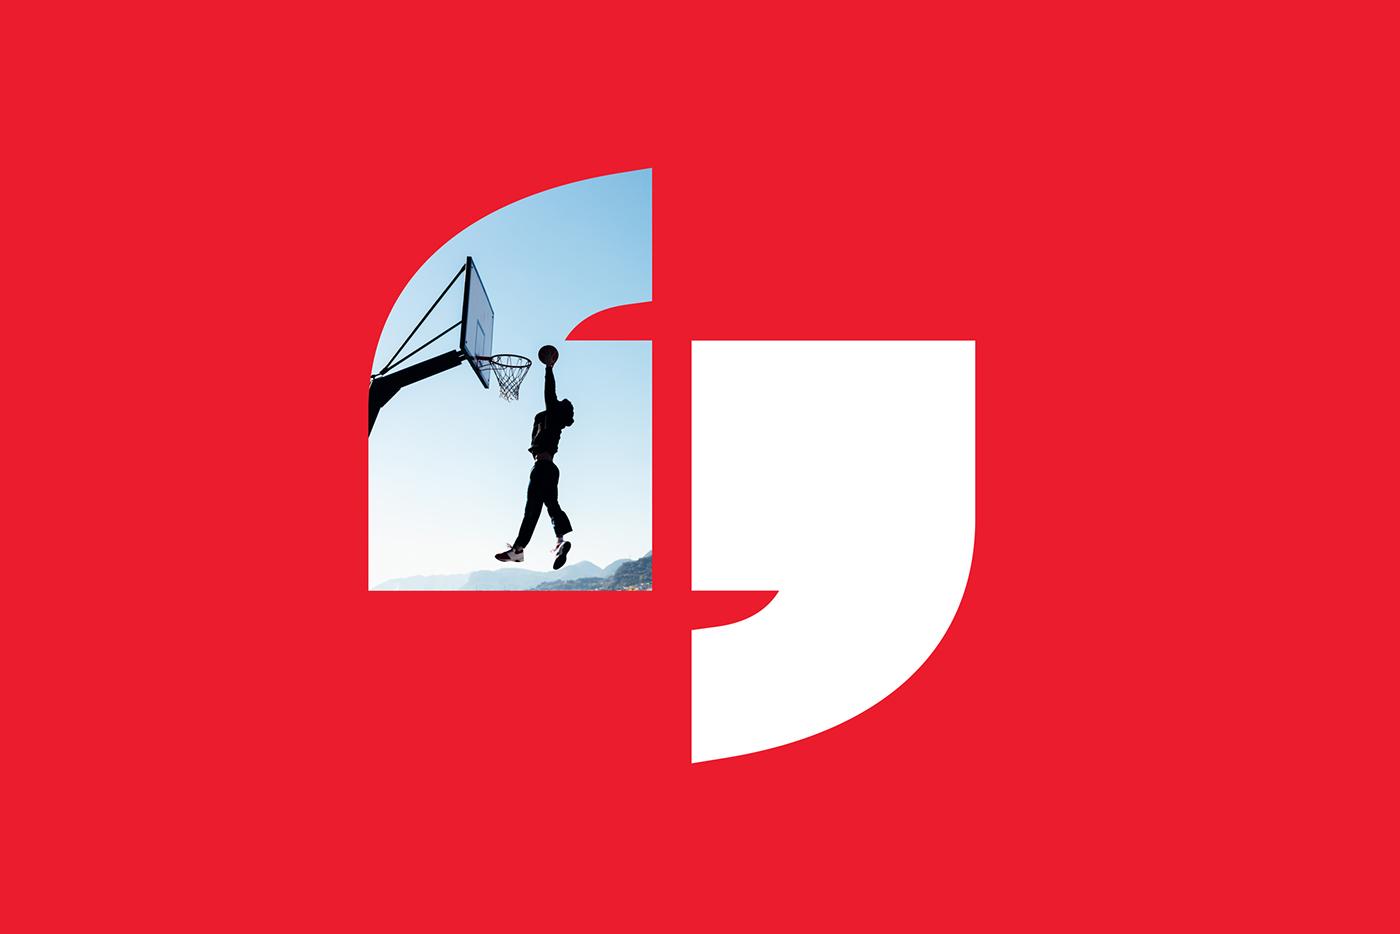 design graphic design  branding  visual identity art direction  Creative Direction  Visual Communication typography   digtial UI